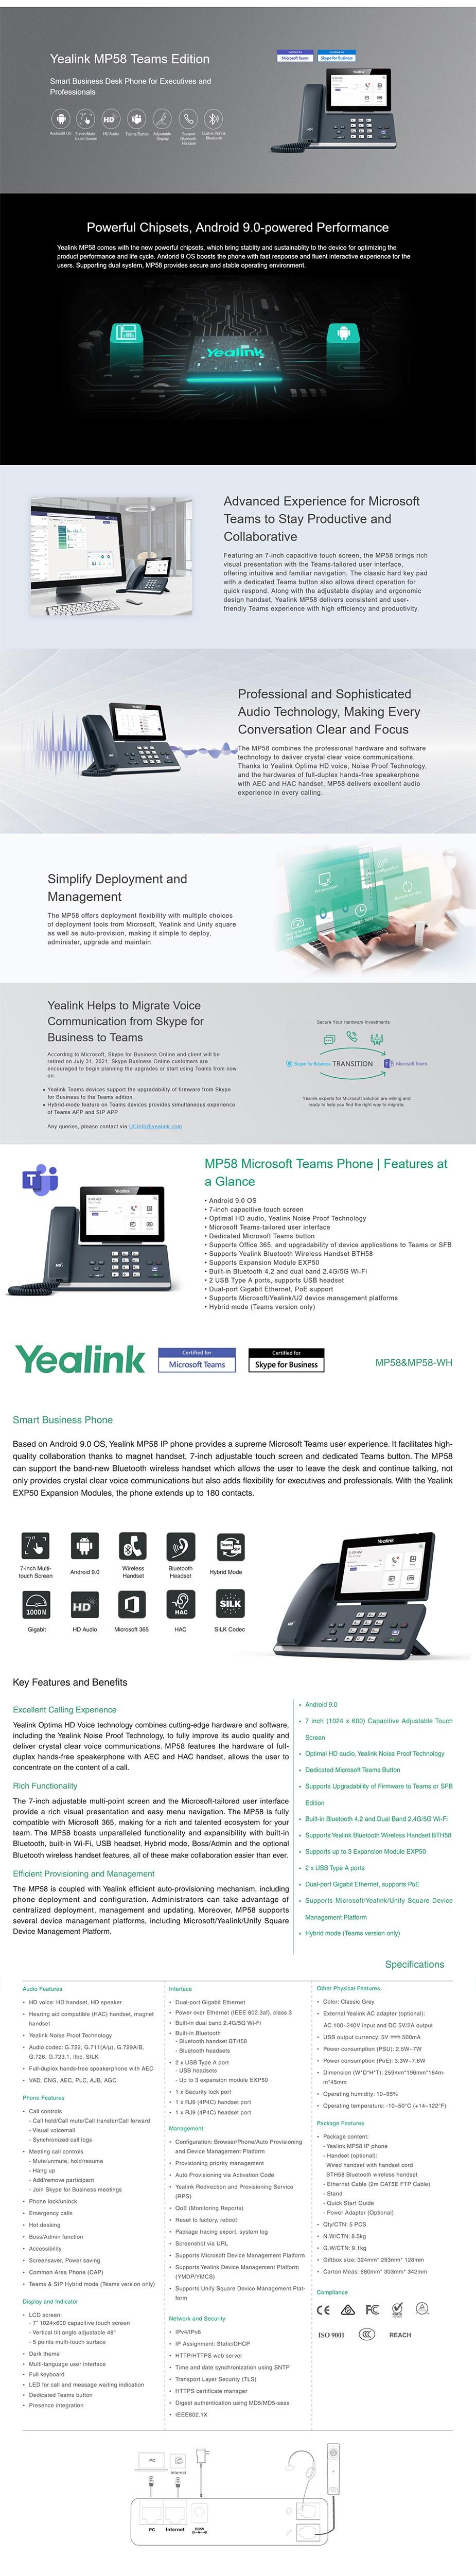 yealink-mp58teams-ip-hd-smart-business-phone-teams-edition-ac42794-2.jpg